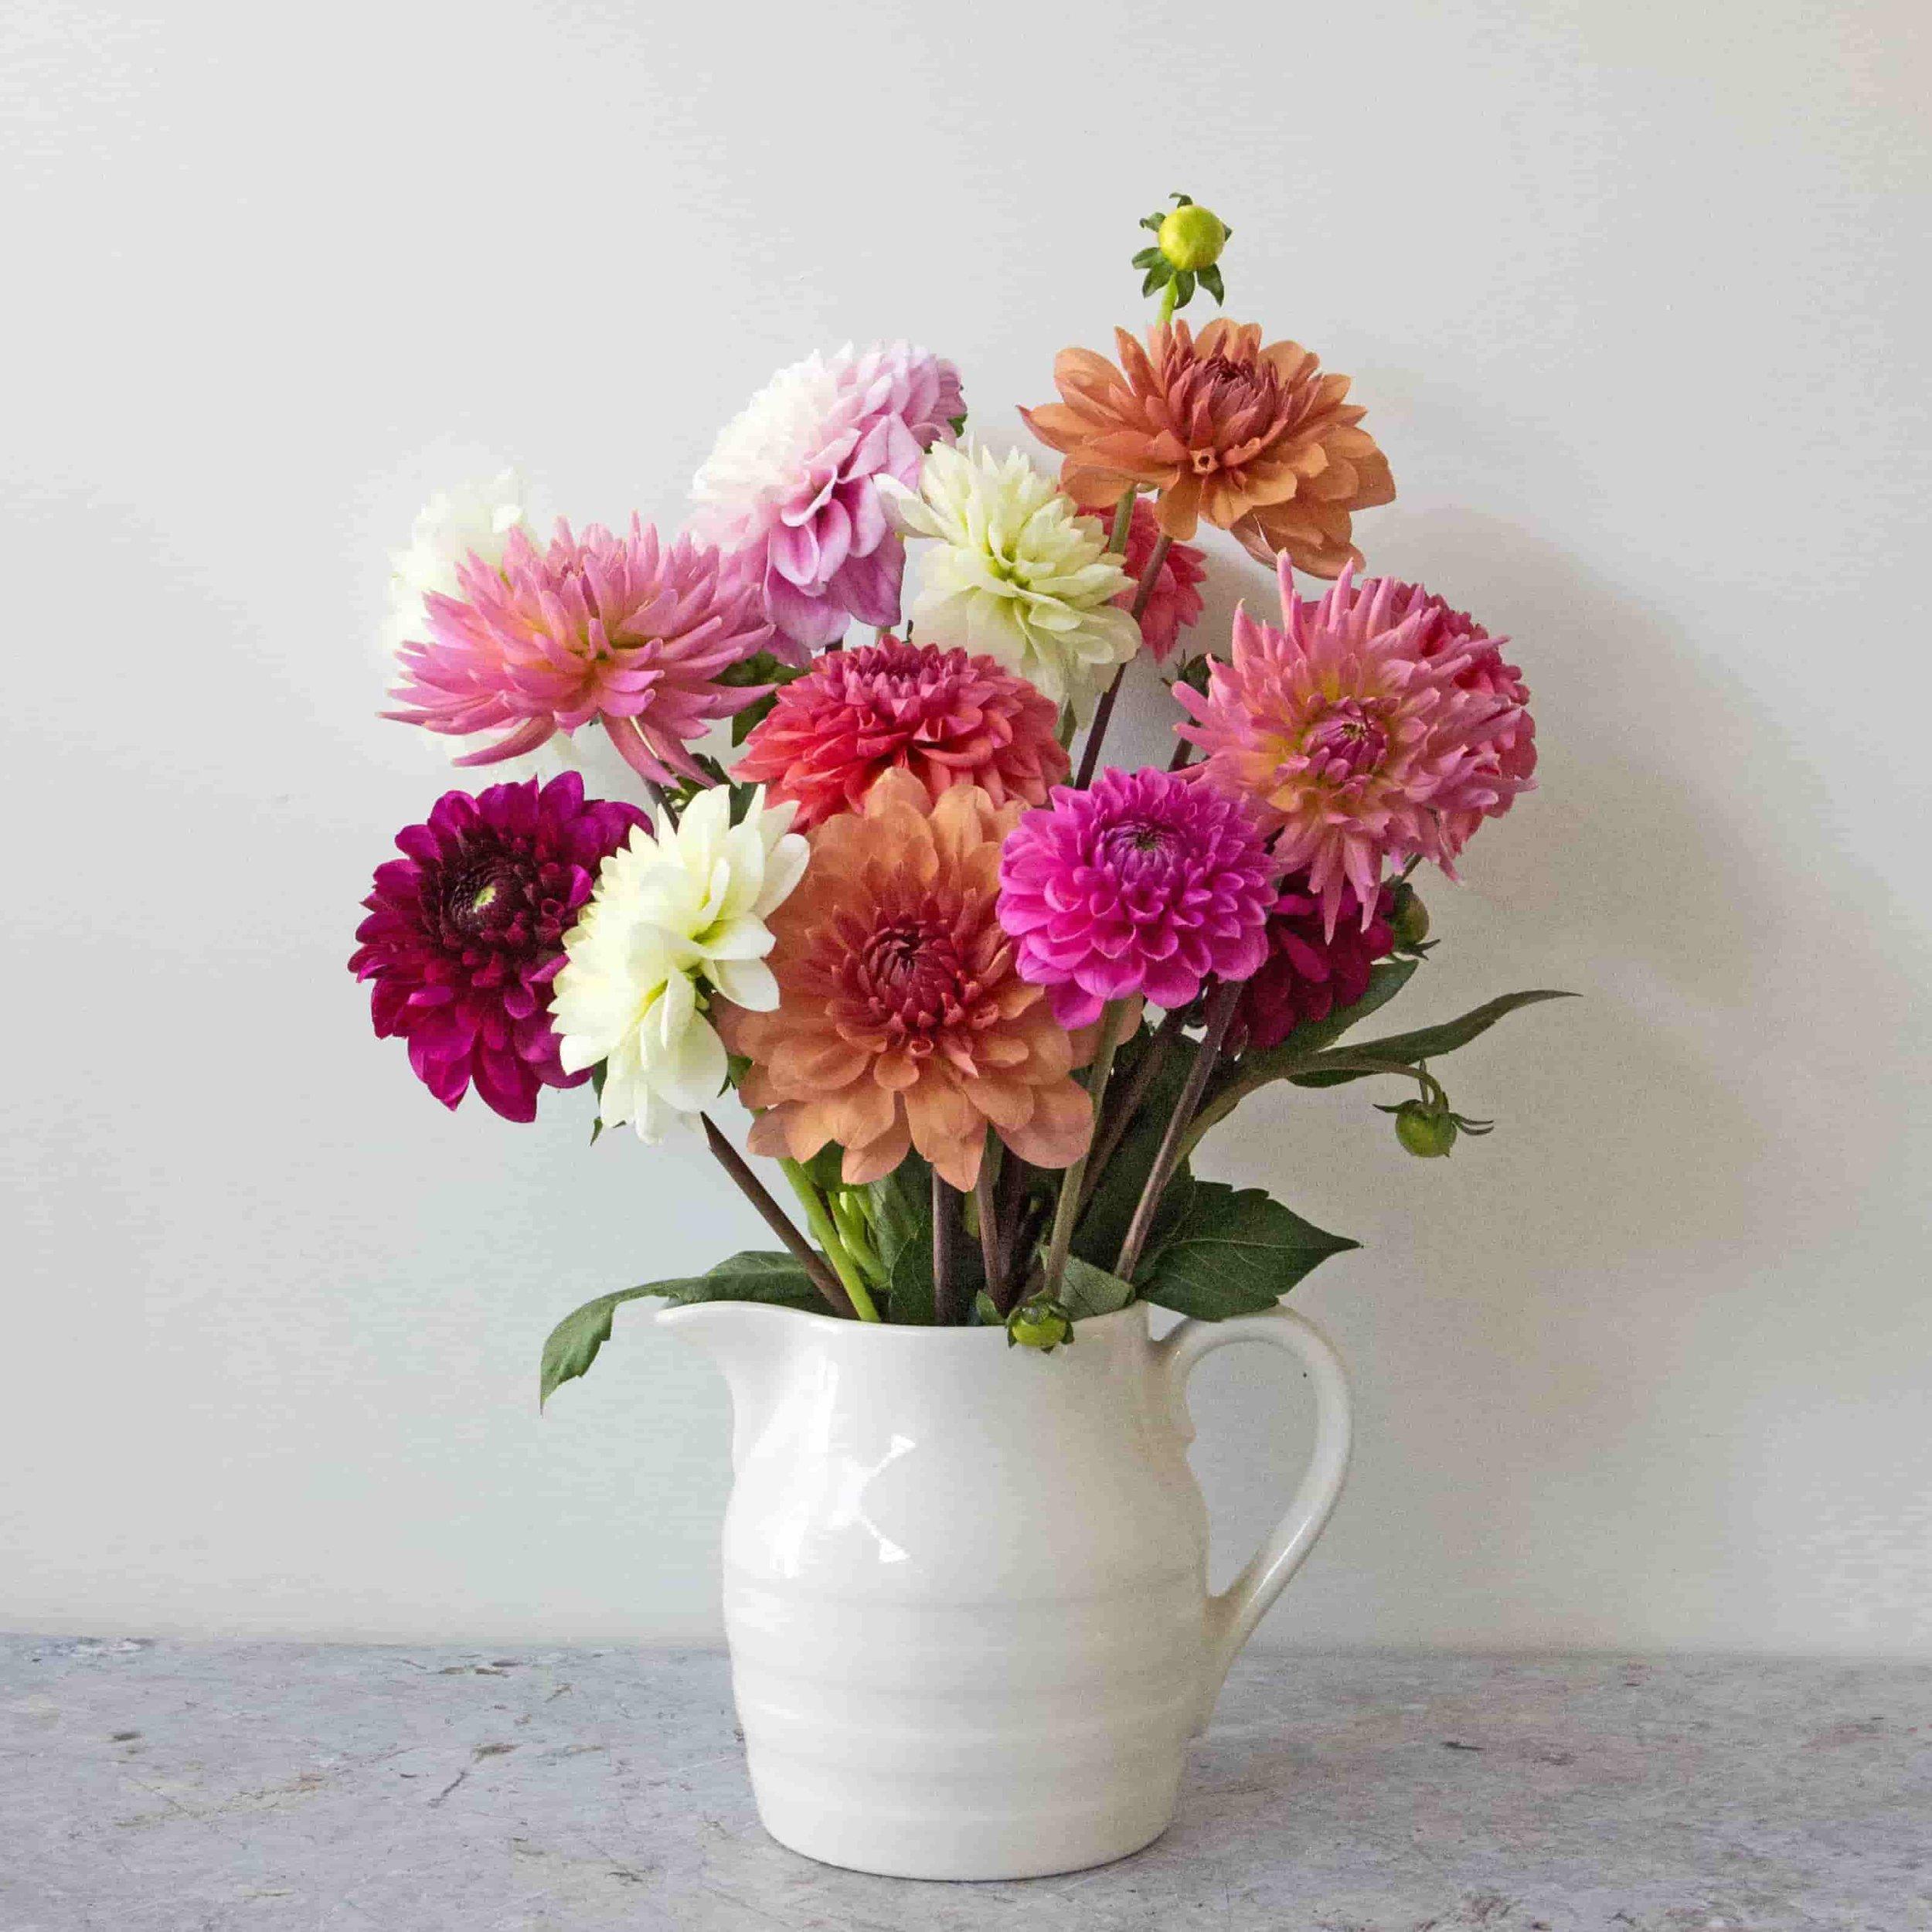 dahlias-vase-close-up-1x1-min.jpg